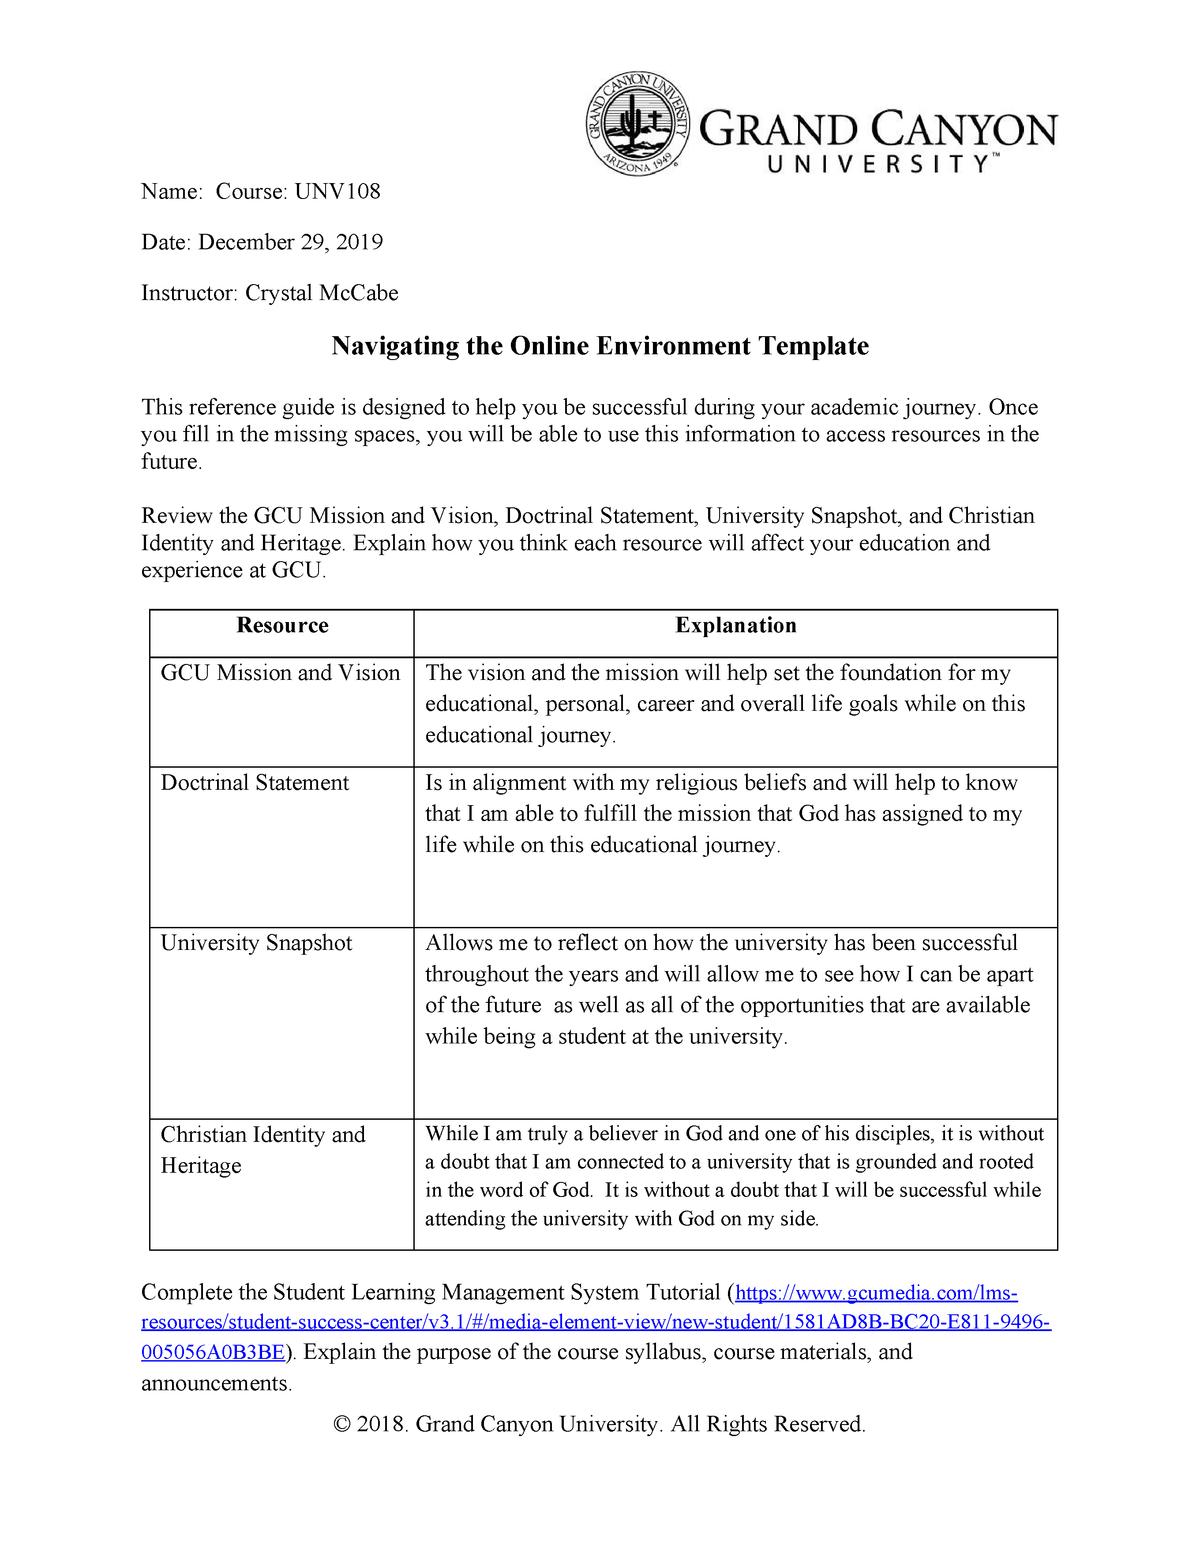 Gcu Academic Calendar 2021 Apply San Diego State University Academic Calendar 2021 in USA